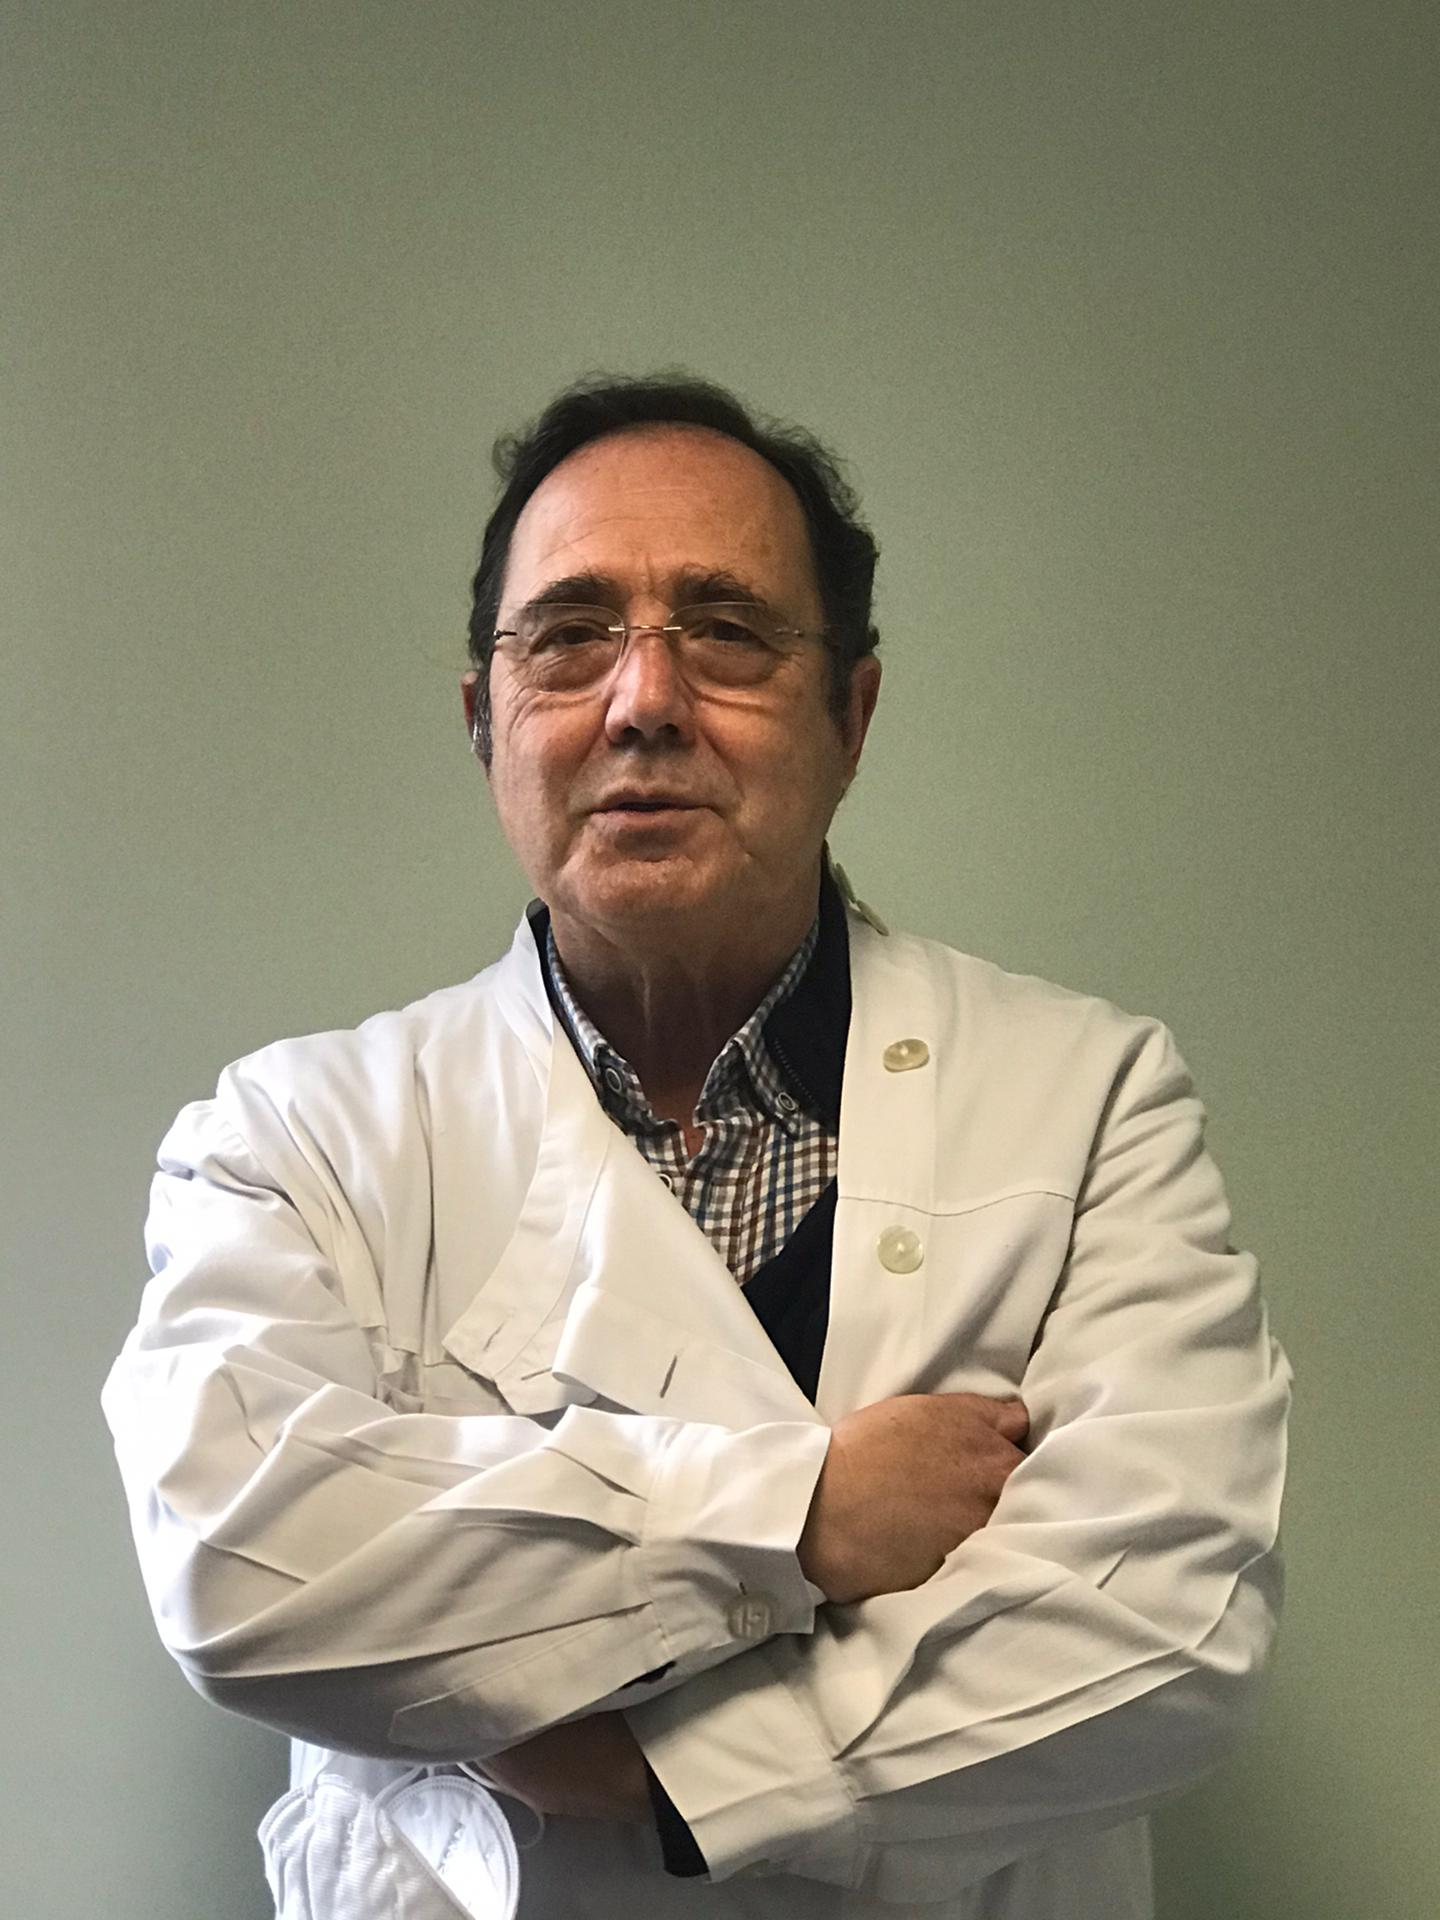 foto dr. joao roque